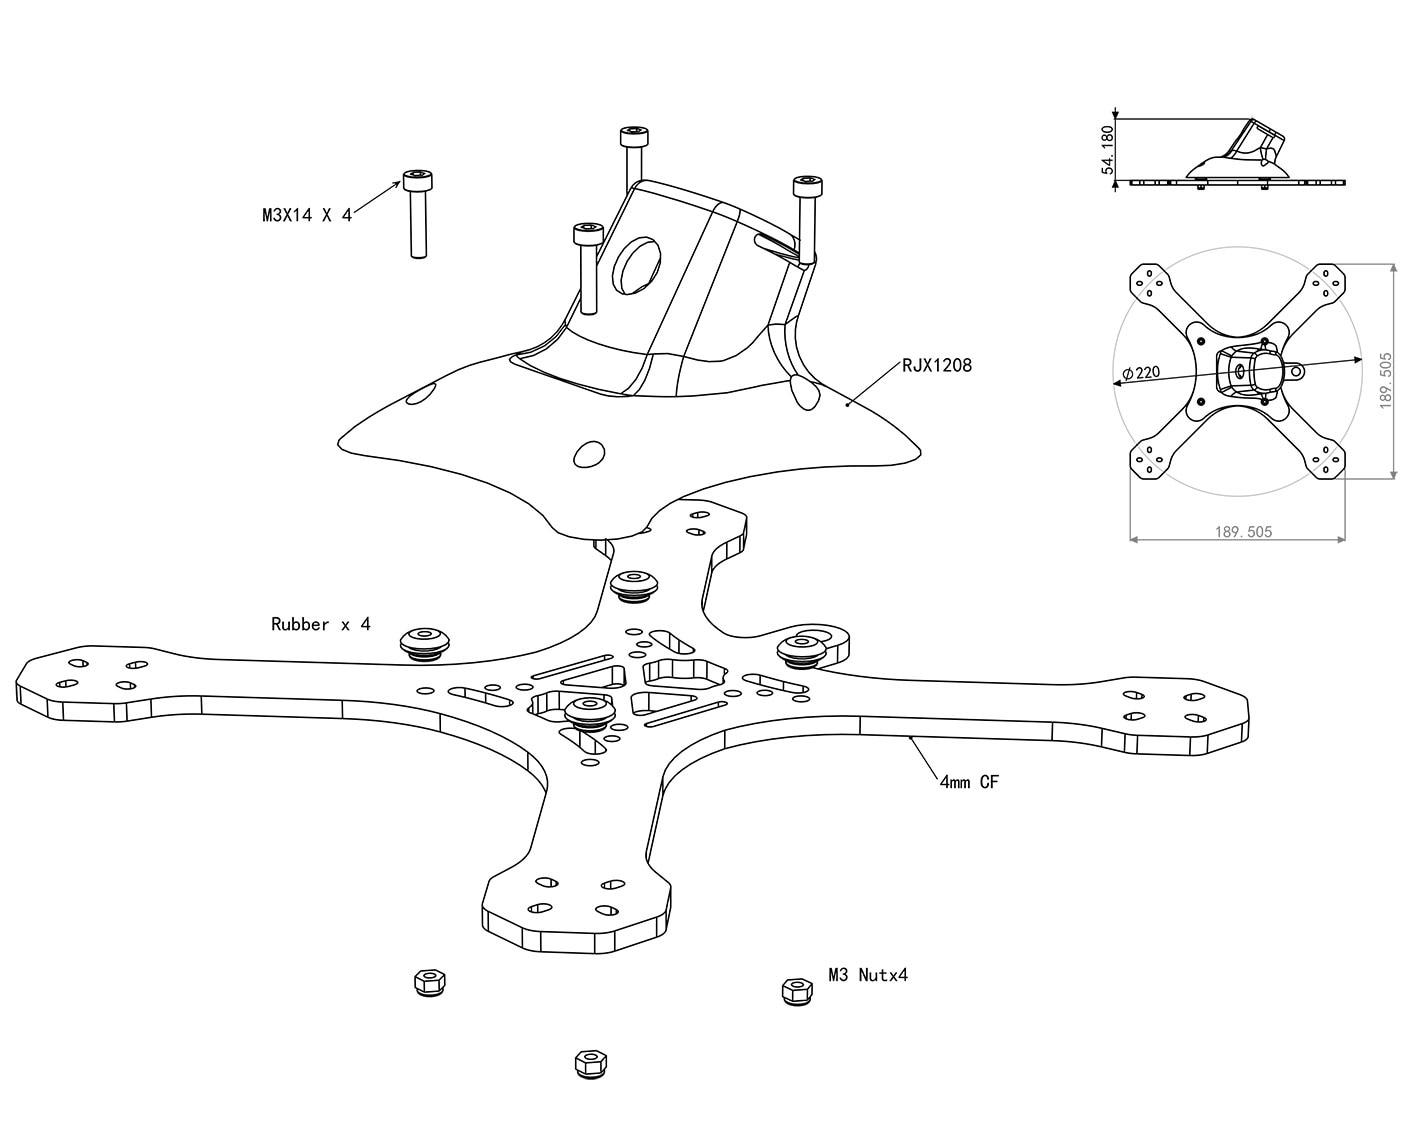 RJX часть X Speed XBR 220 FPV гоночный Дрон RC комплект Квадрокоптер разобранный мультиротор запчасти - 6